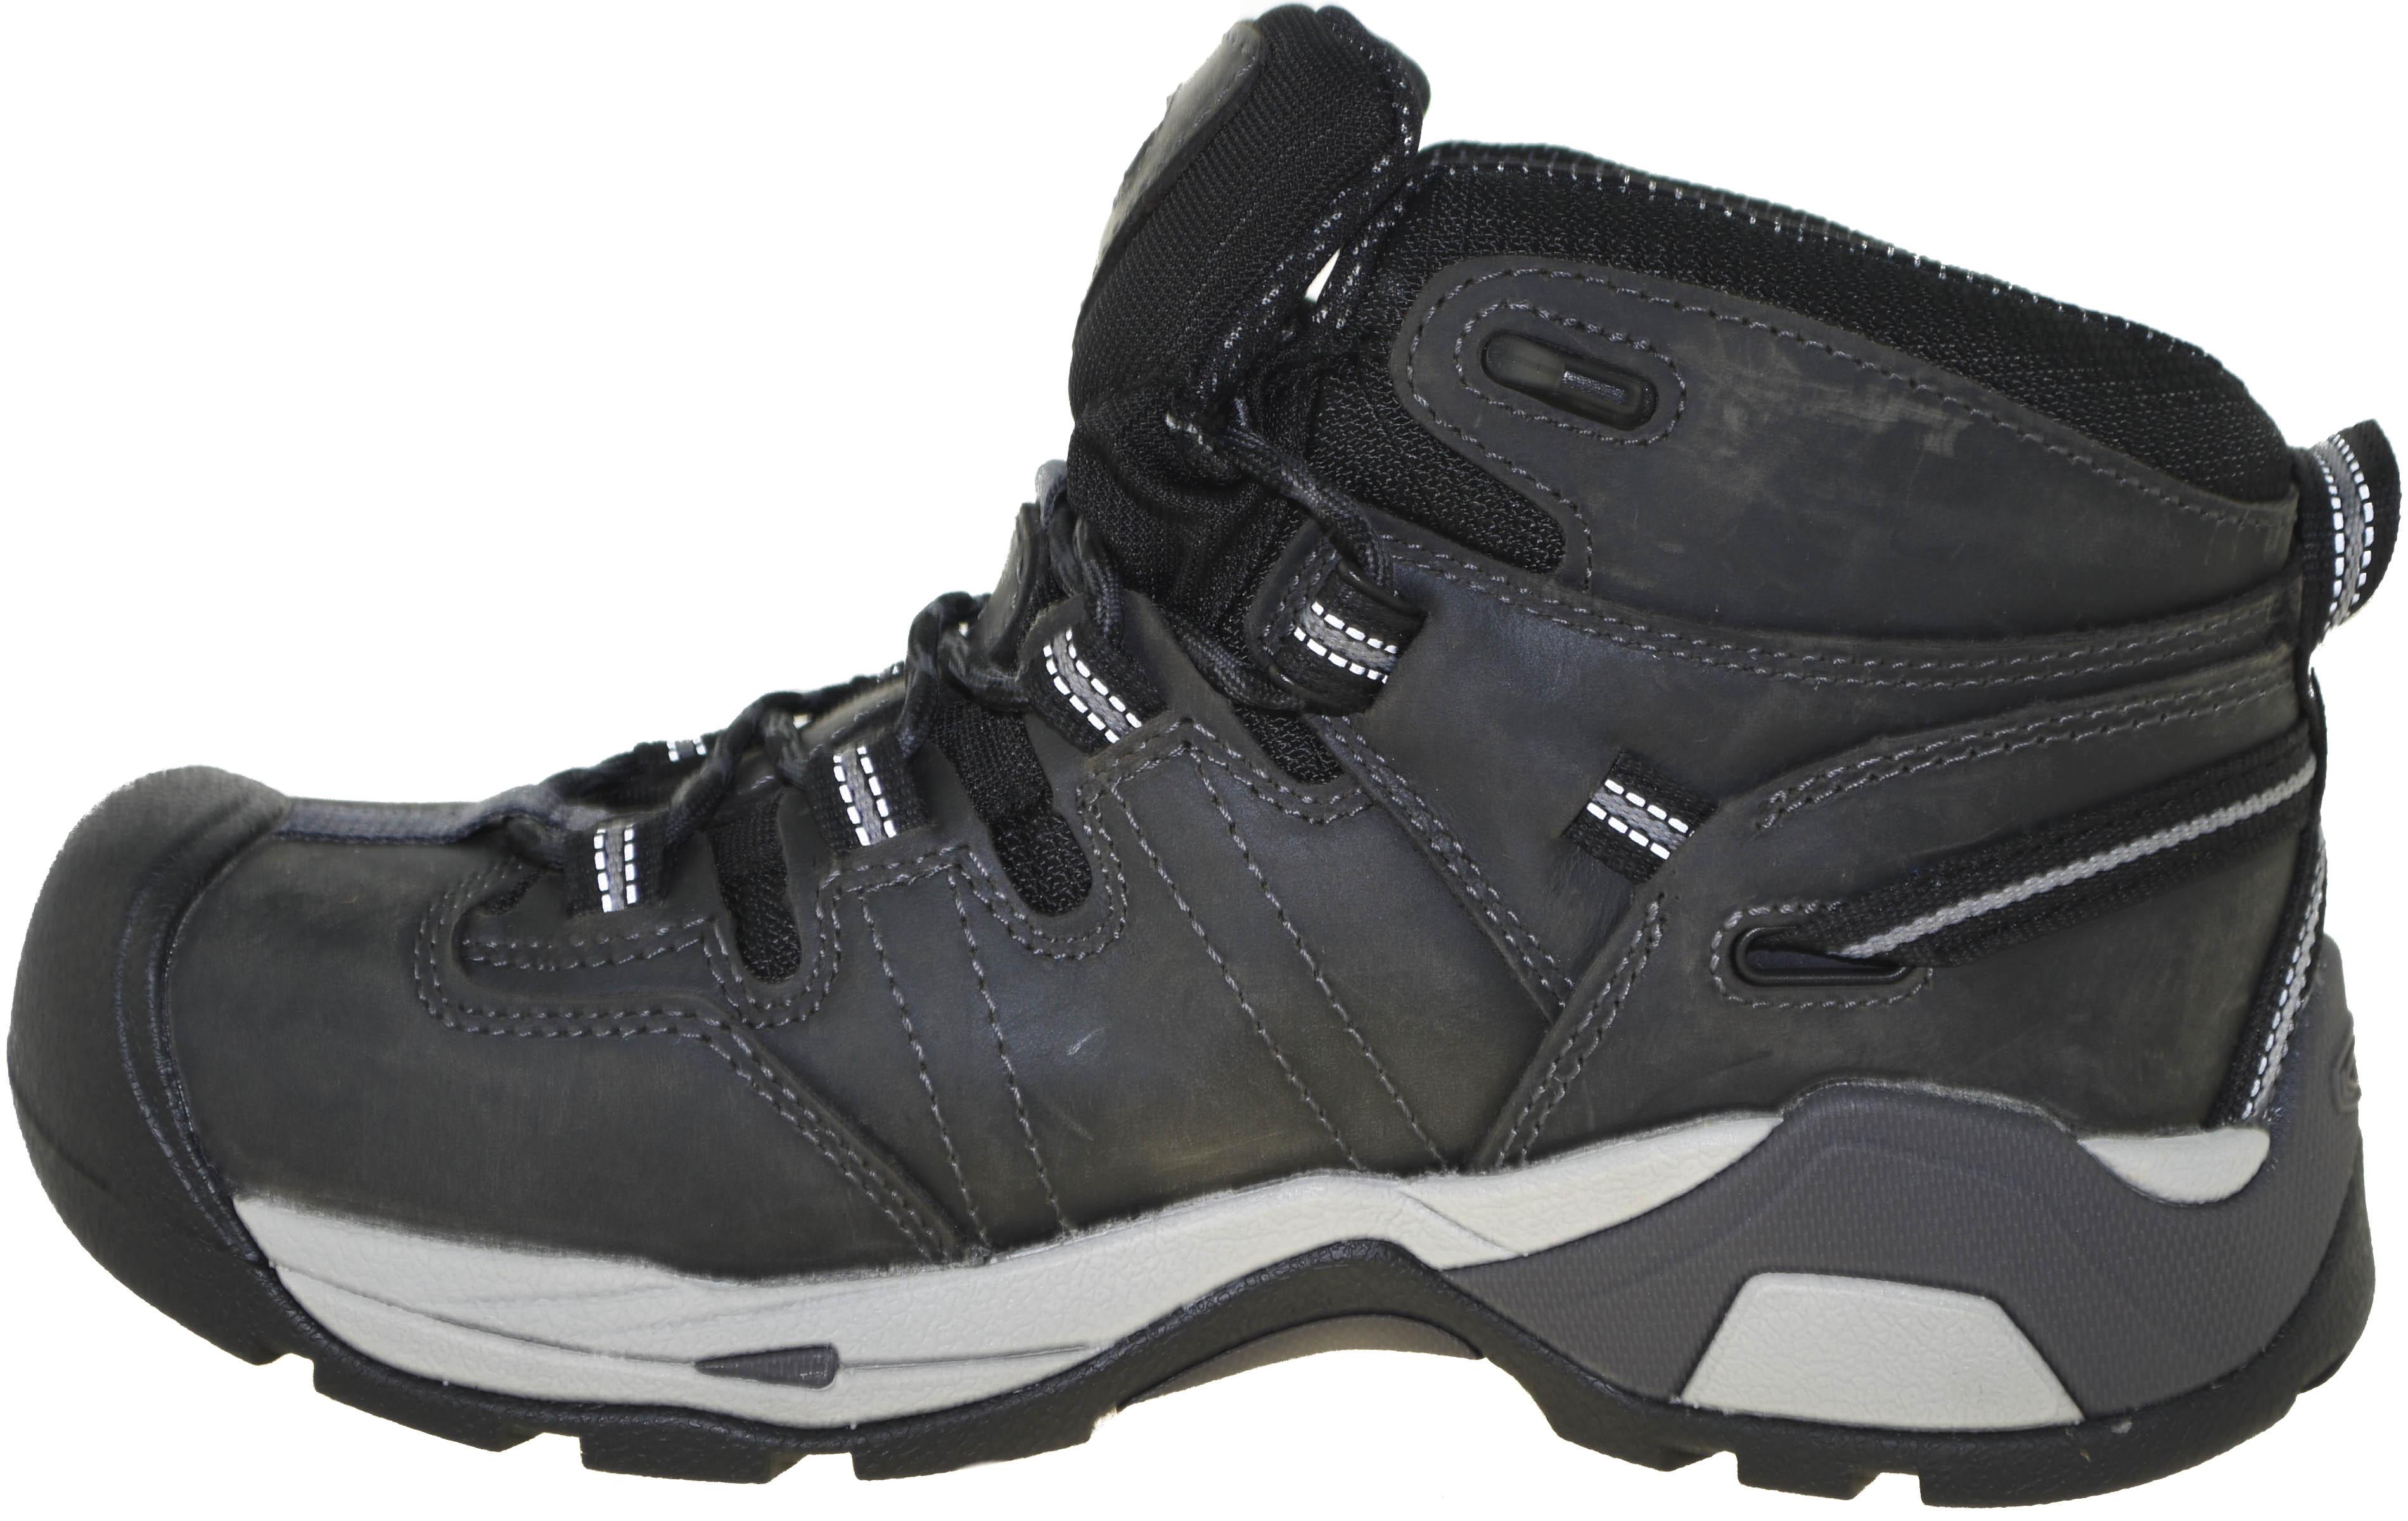 be4e0b461285 Keen Utility Men s Detroit XT Mid Soft Toe Boots Style 1020144